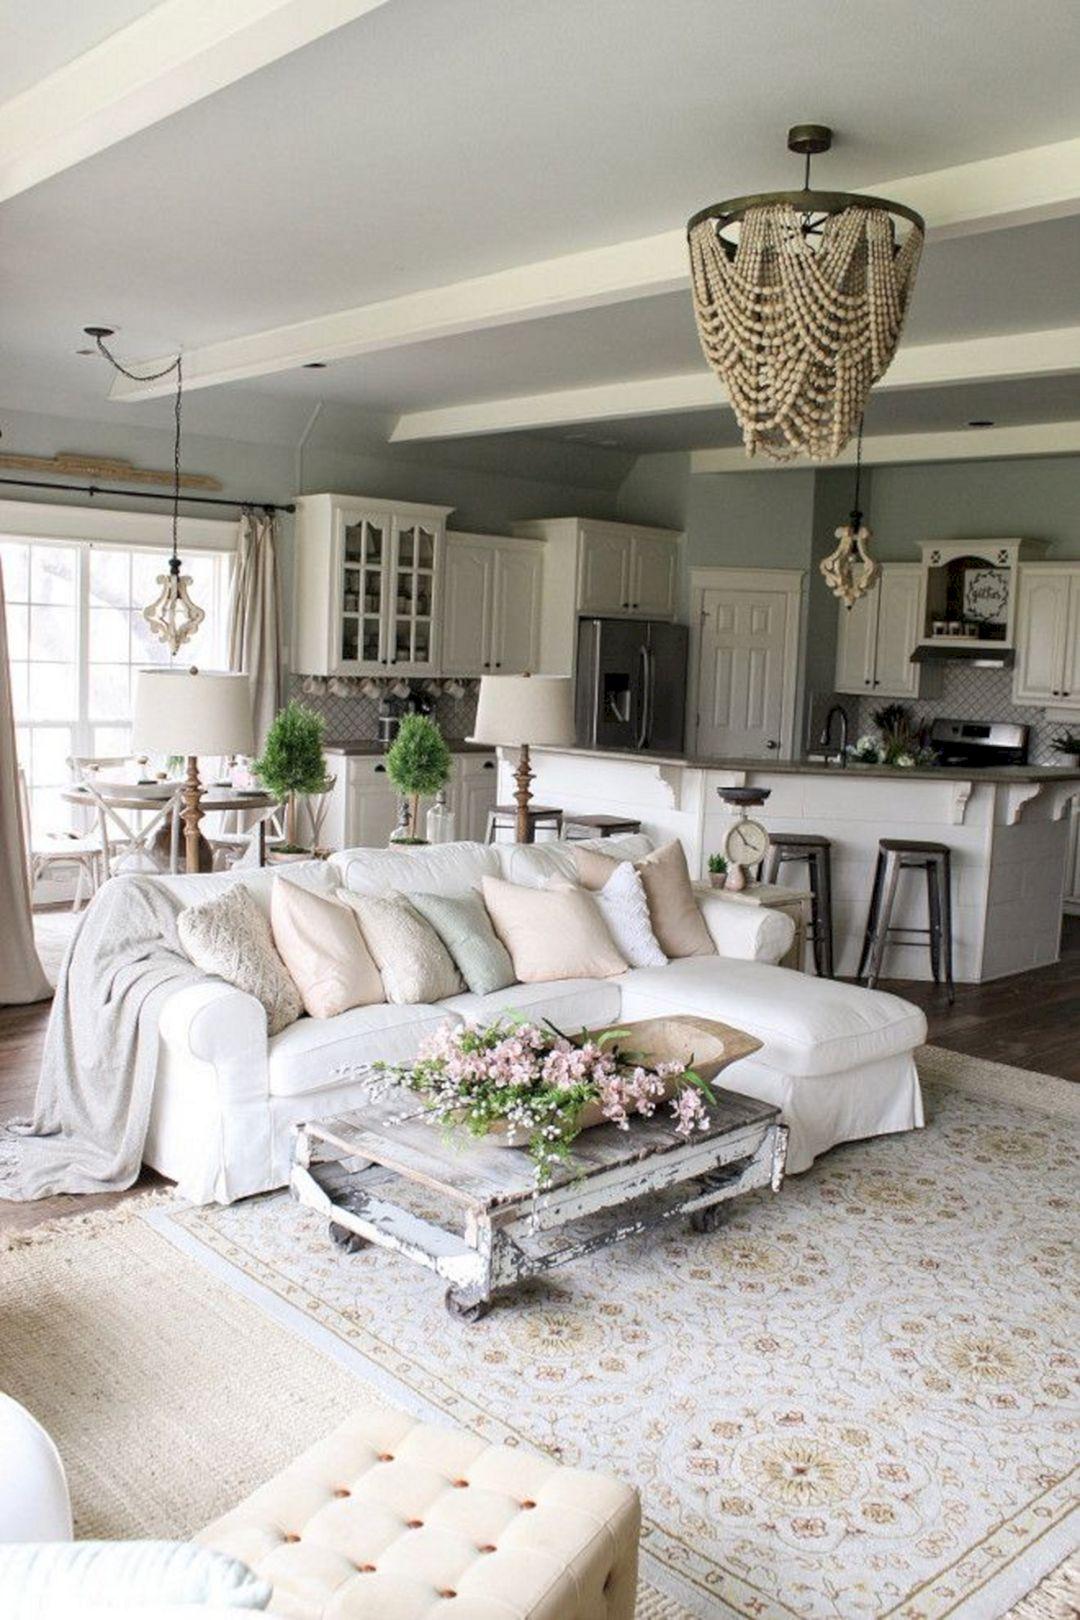 incredible shabby chic apartment decor | Shabby Chic Apartment Living Room 4 (Shabby Chic Apartment ...